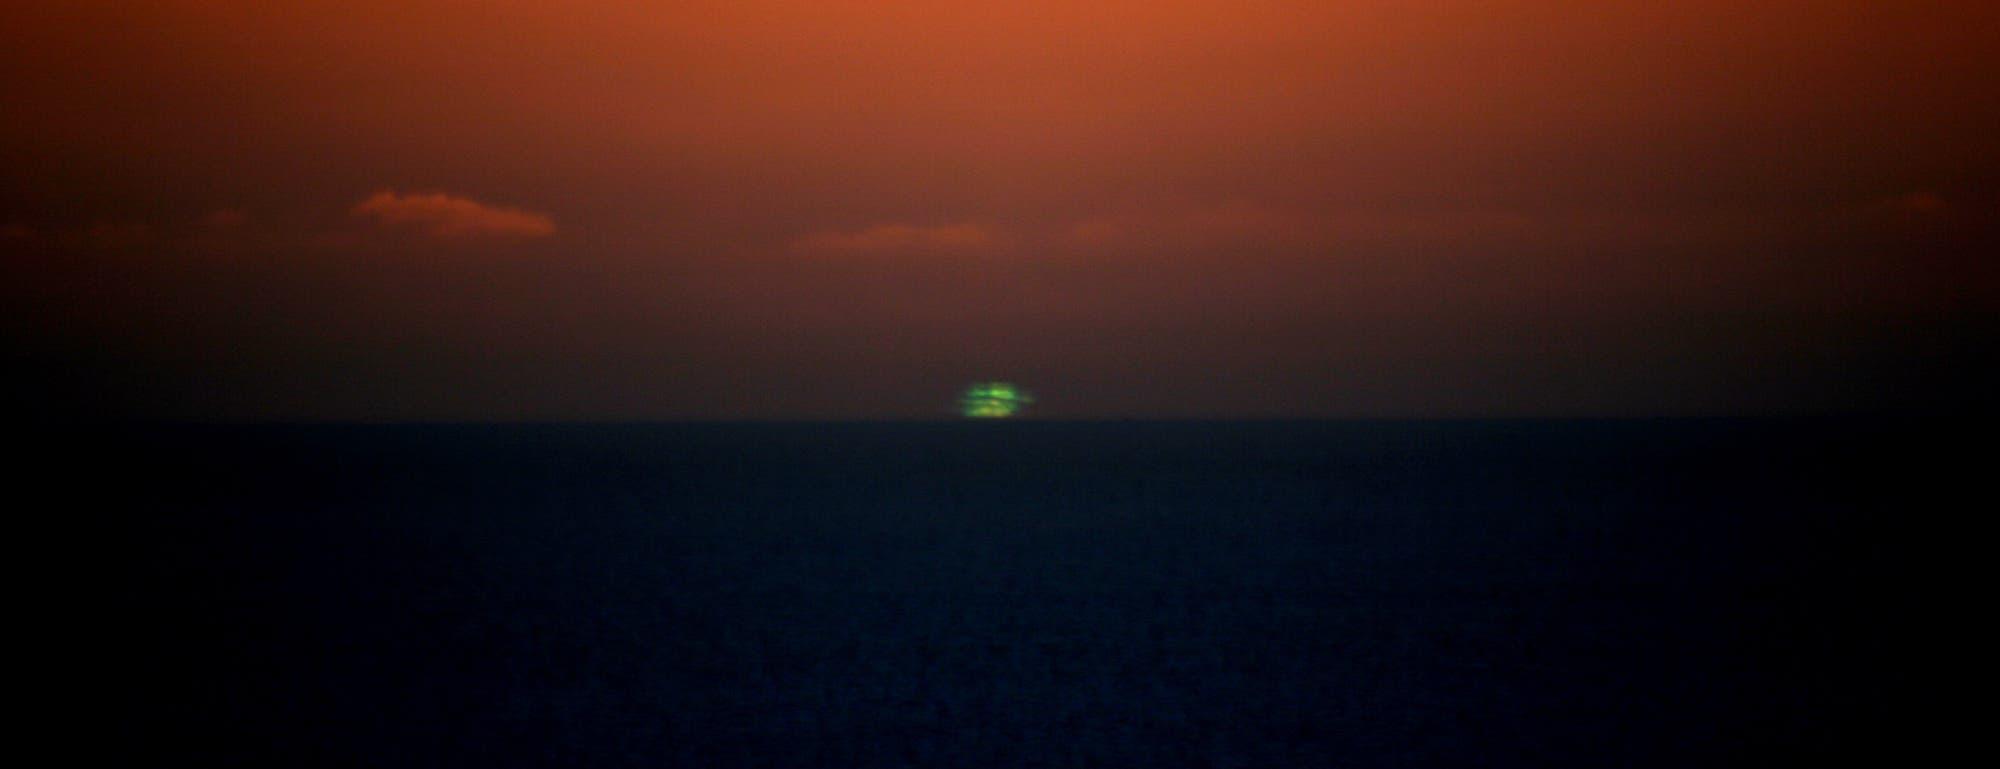 Grüner Blitz beim Sonnenuntergang